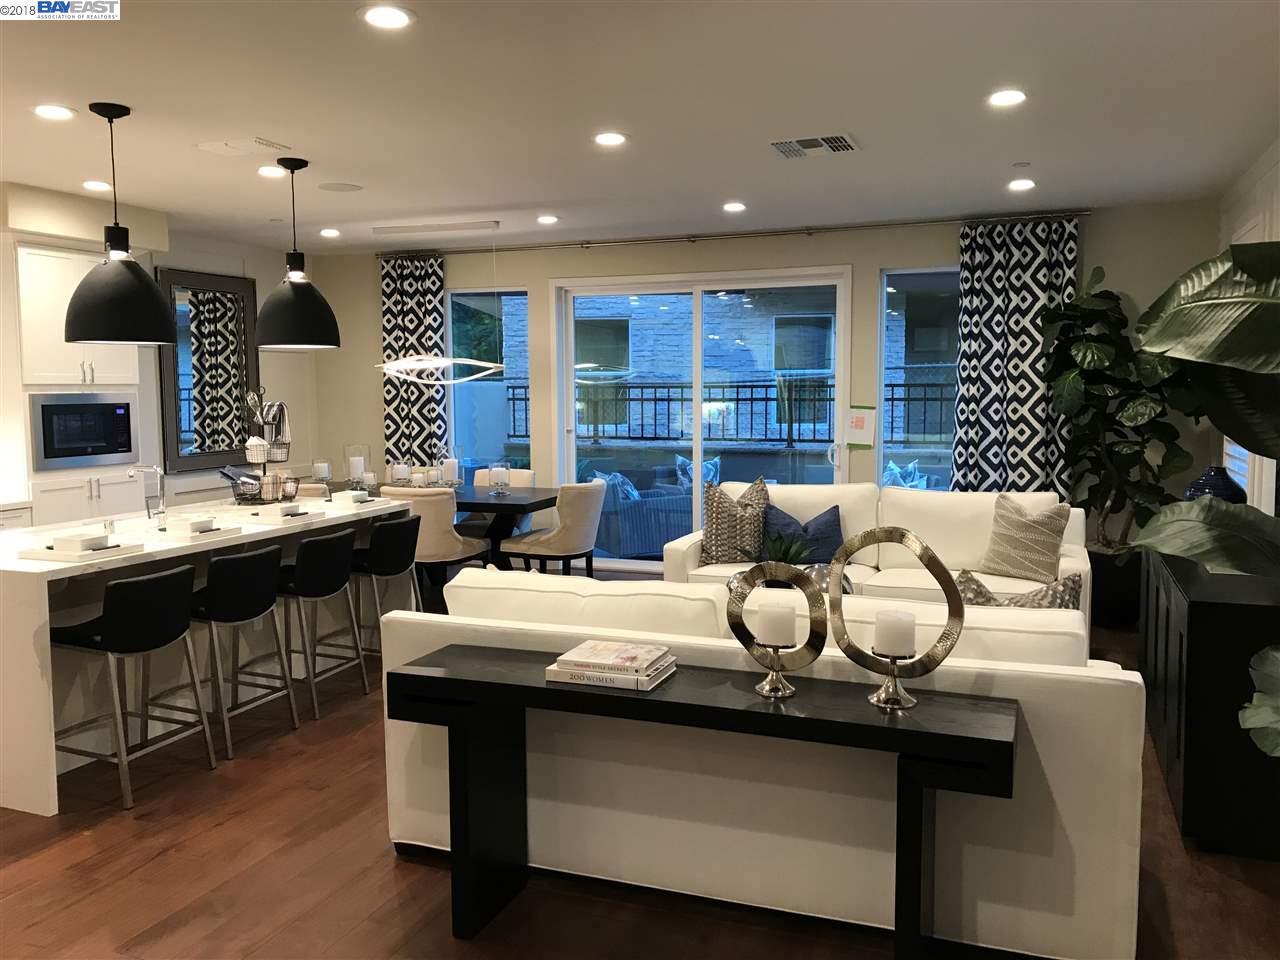 Condominium for Sale at 305 Stoneyridge Lane 305 Stoneyridge Lane Walnut Creek, California 94596 United States